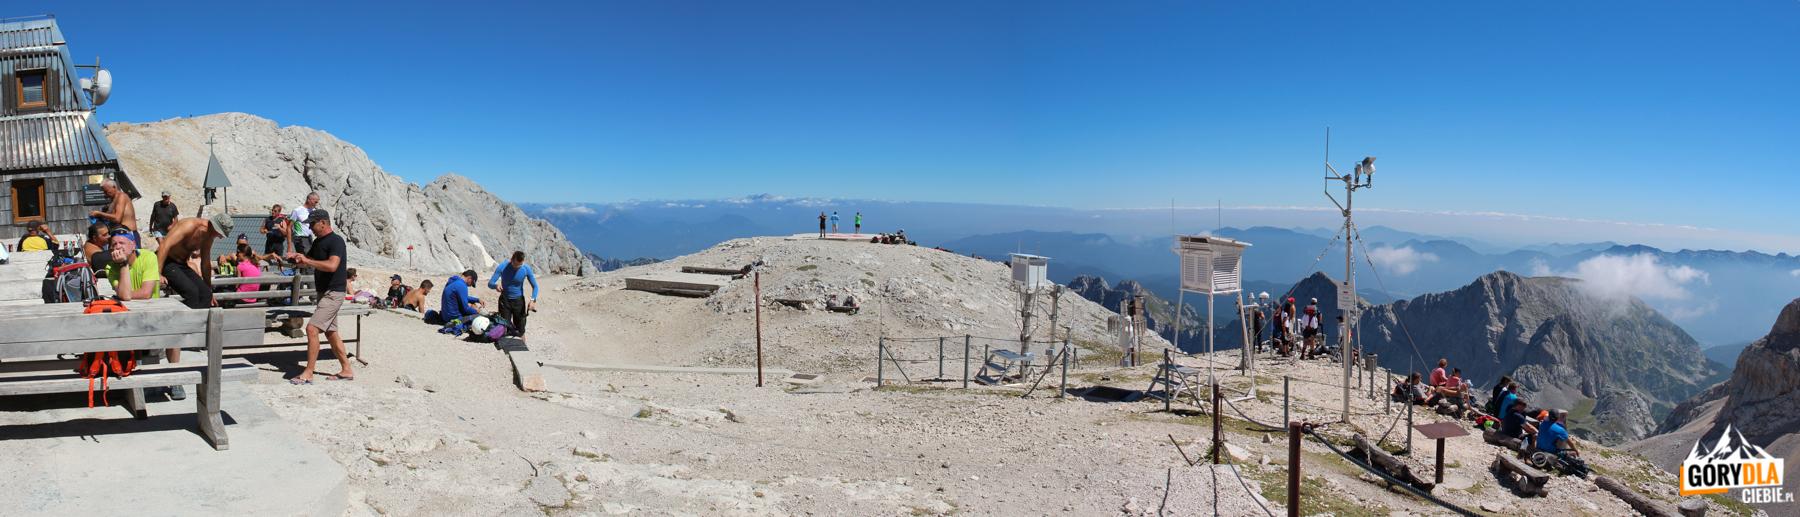 "Otoczenie schroniska ""Triglavski dom naKredarici"" (2515 m)"